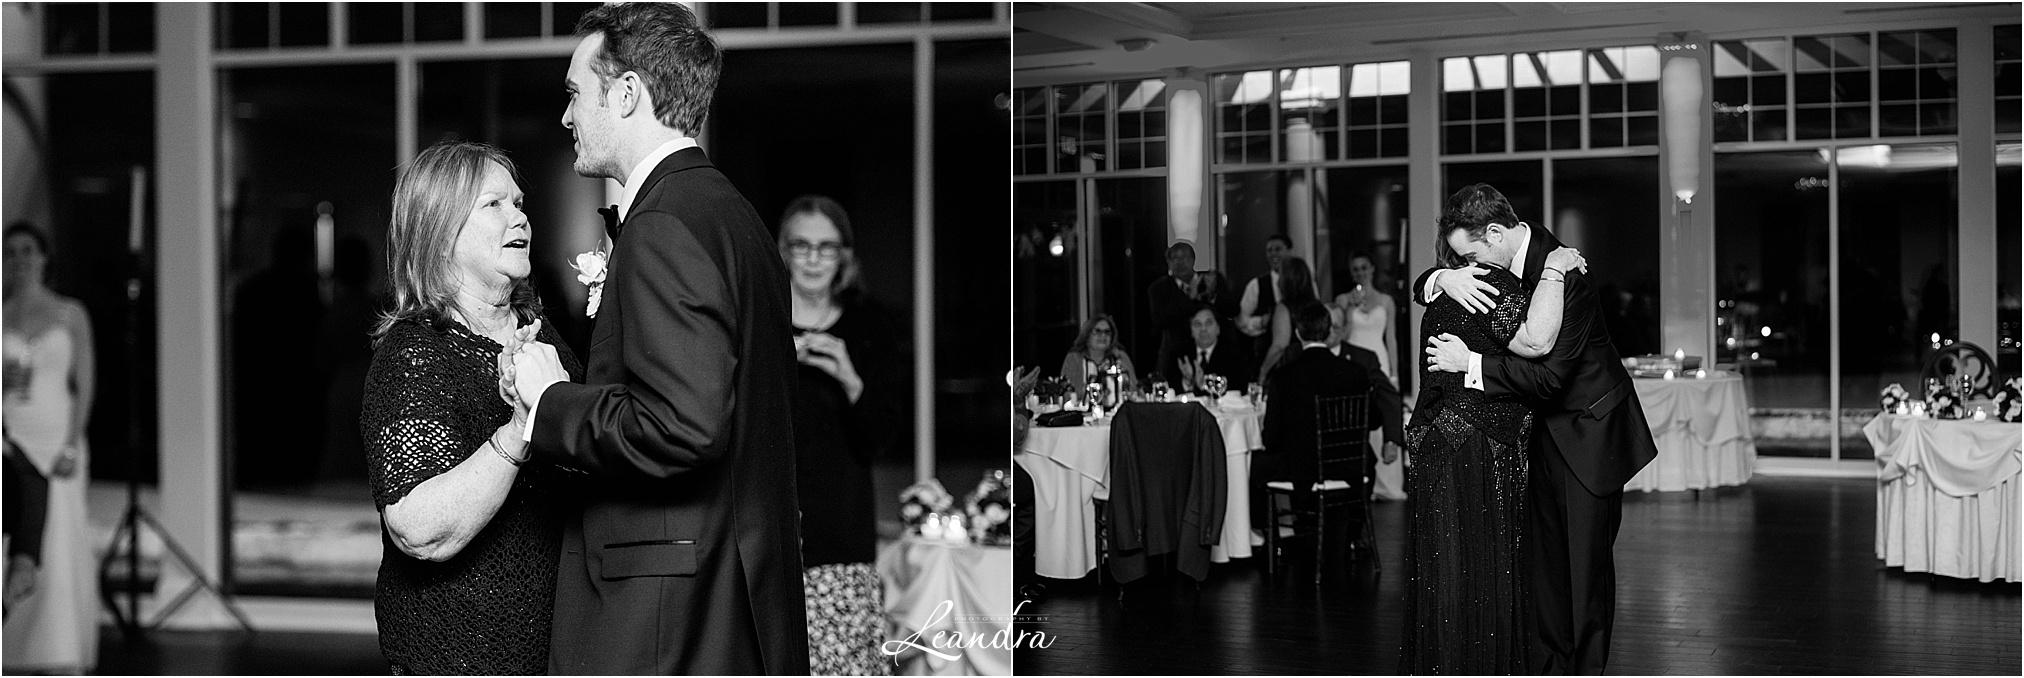 Mother son dance Stonebridge Country Club Wedding_0042.jpg